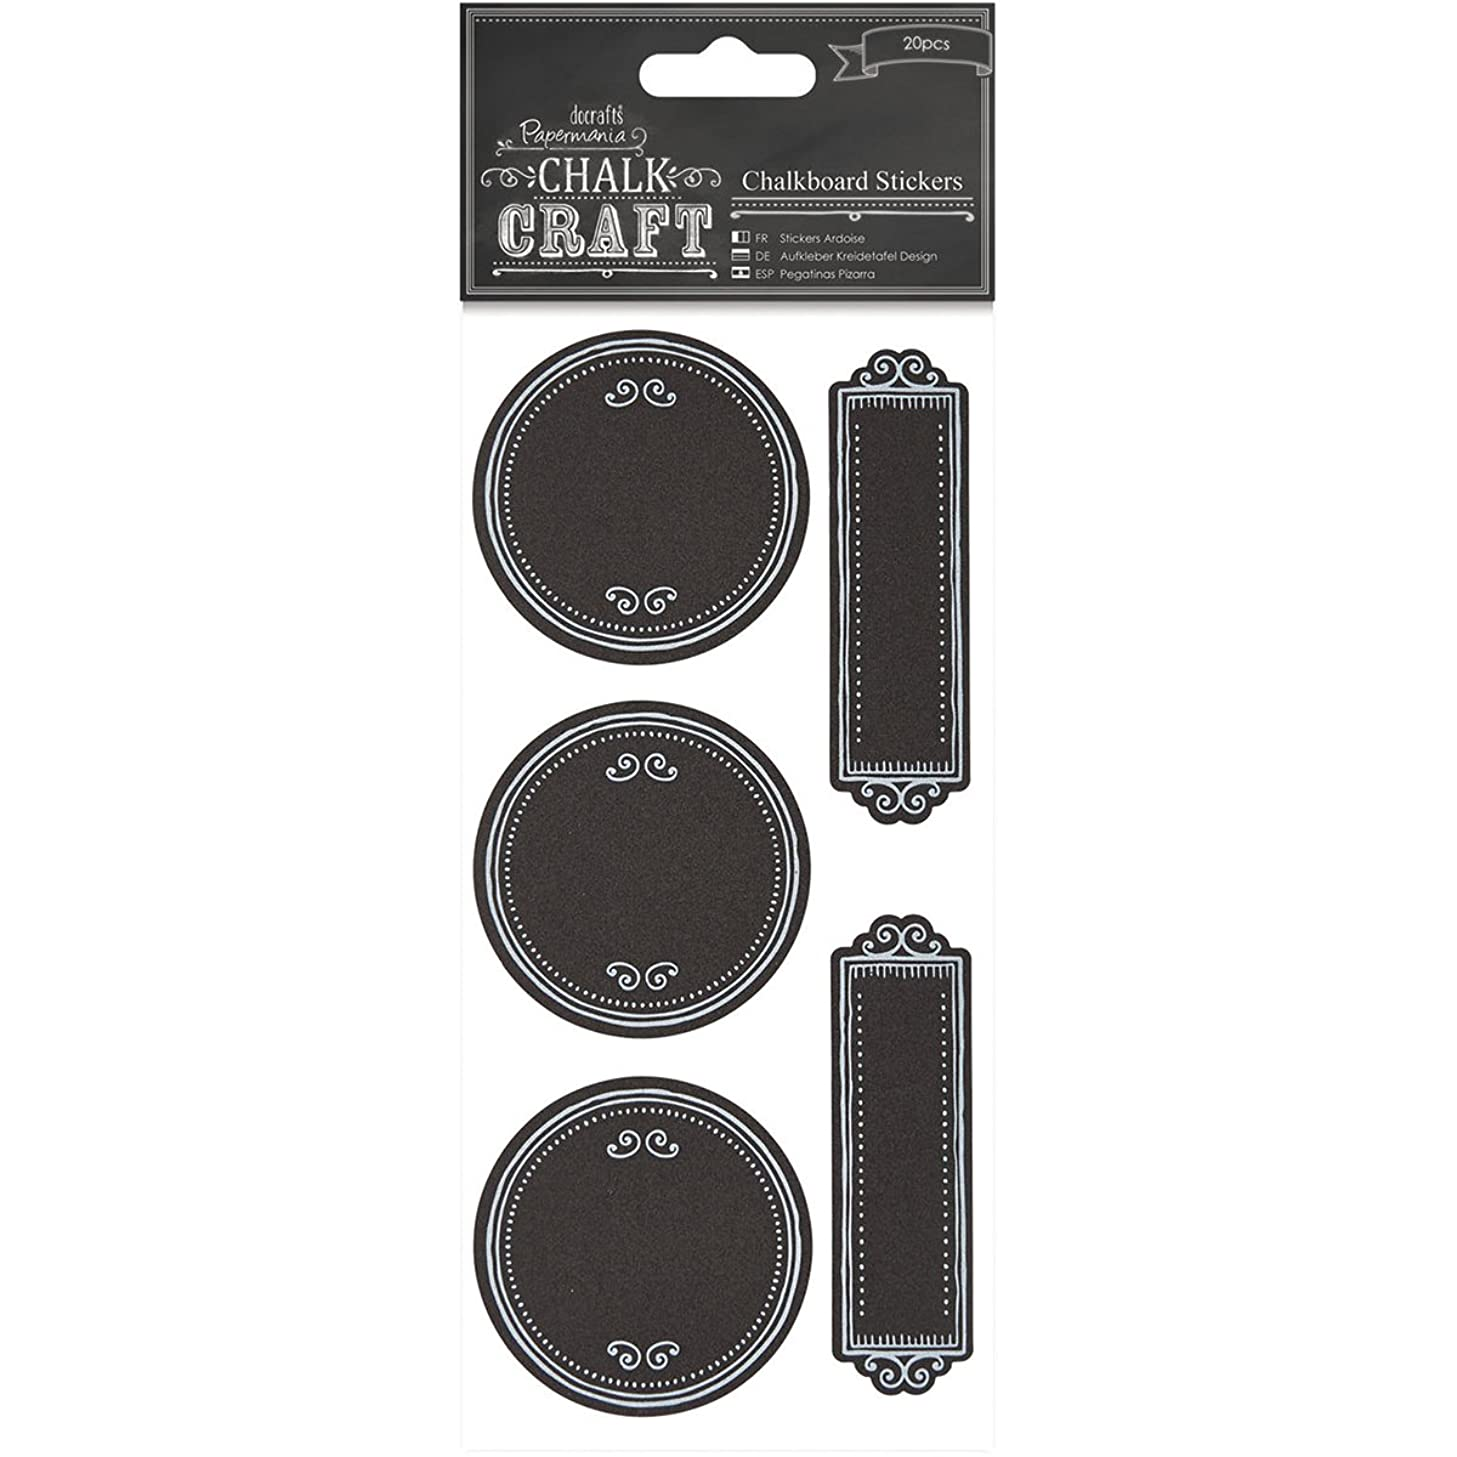 DOCrafts PM355409 Chalk Craft Chalkboard Stickers Dotty Frames